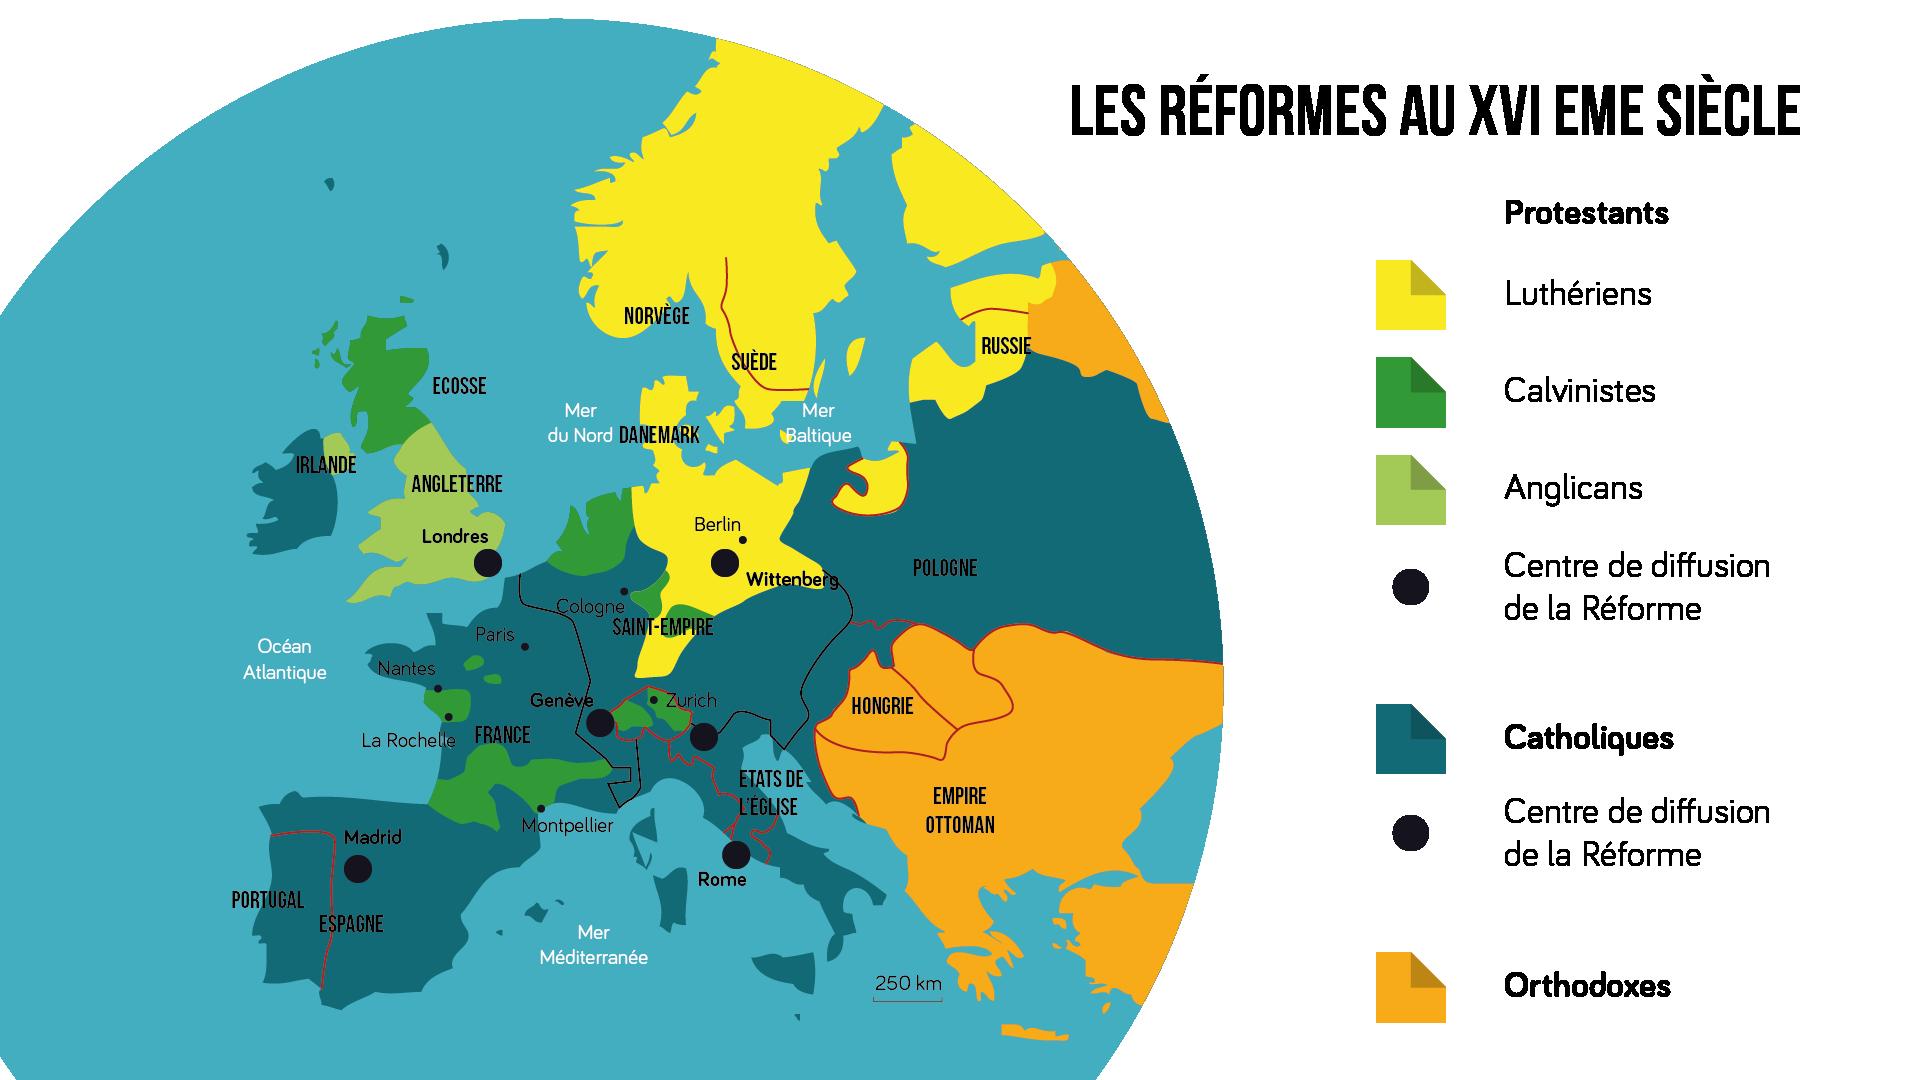 Diffusion du protestantisme en Europe